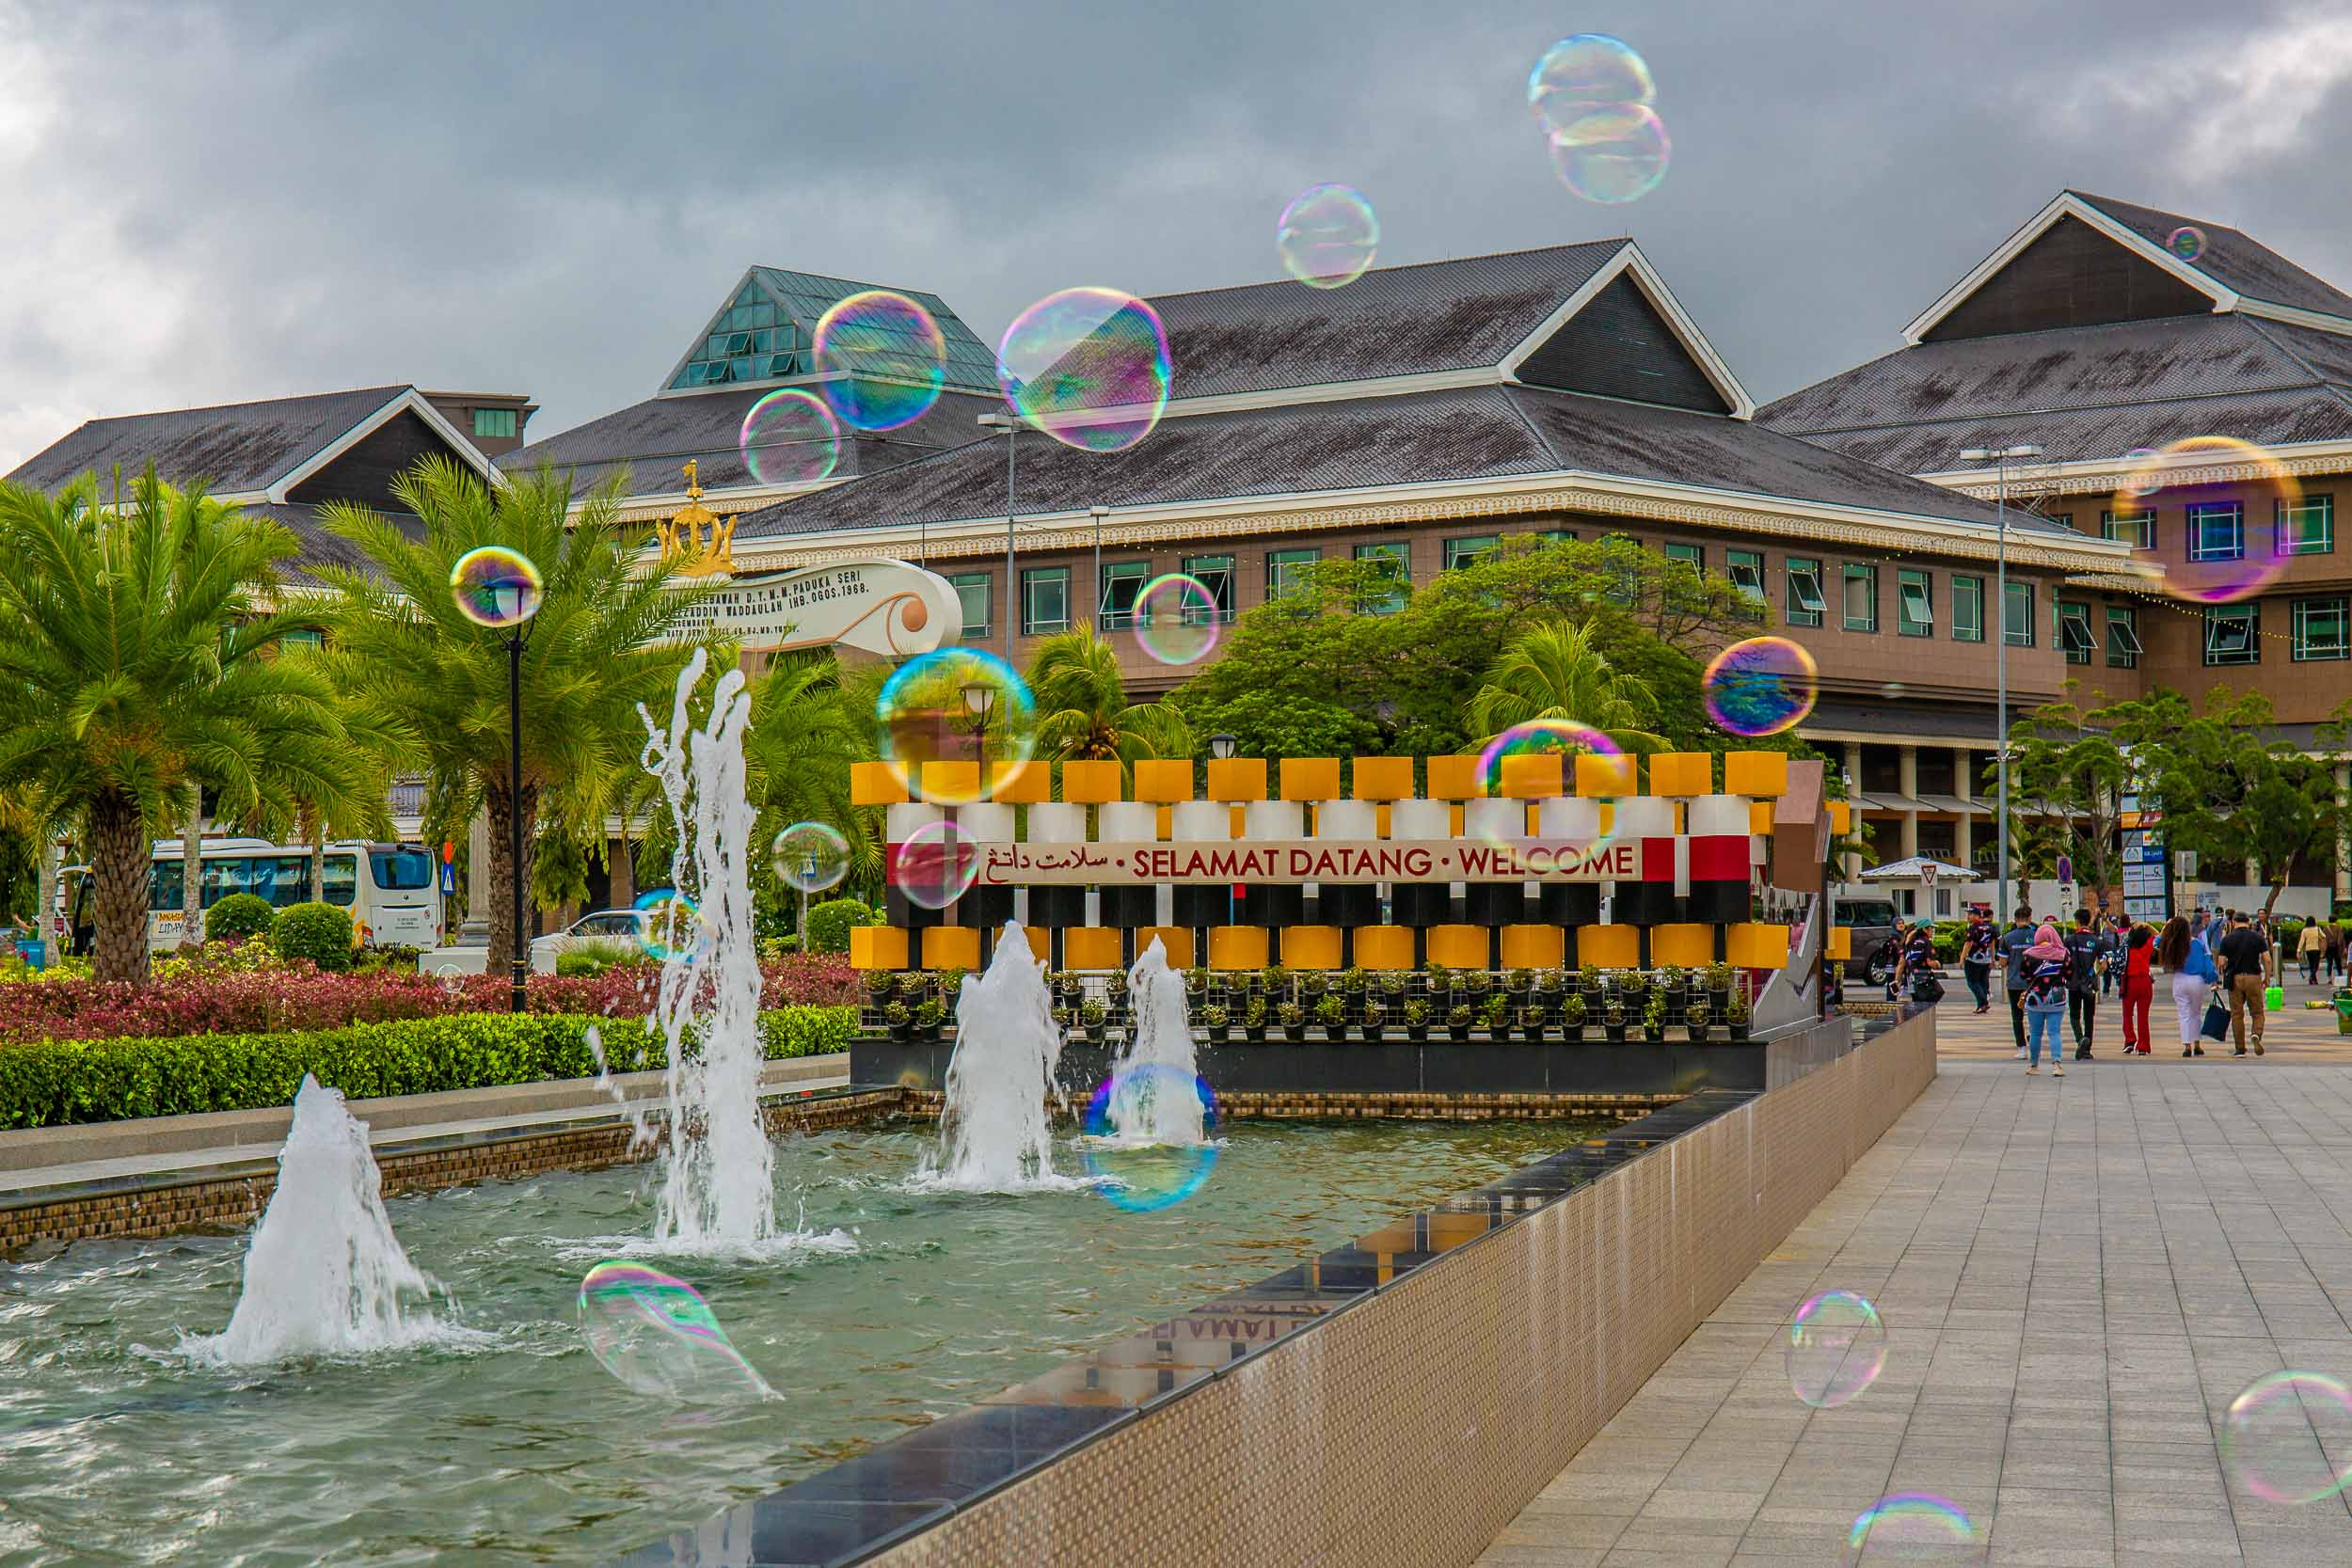 Street vendors products on show, Bandar Seri Begawan, Brunei